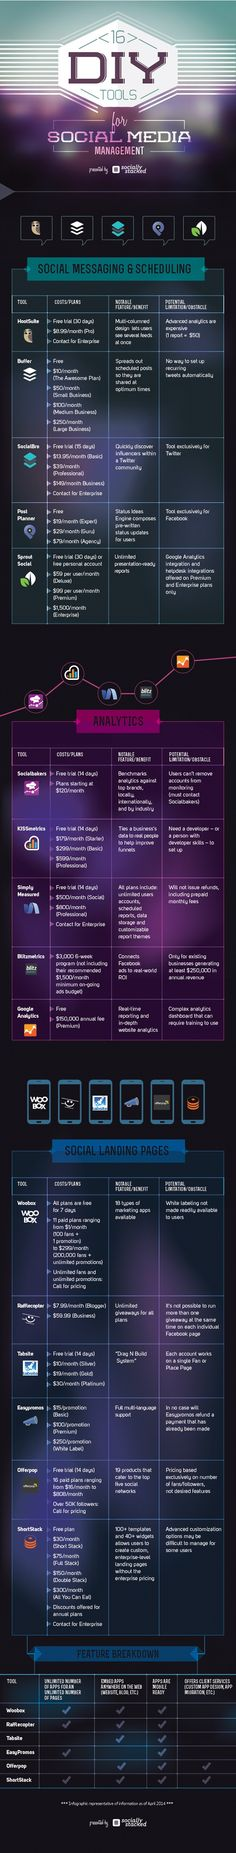 #Social #Infographic: 16 DIY social media tools